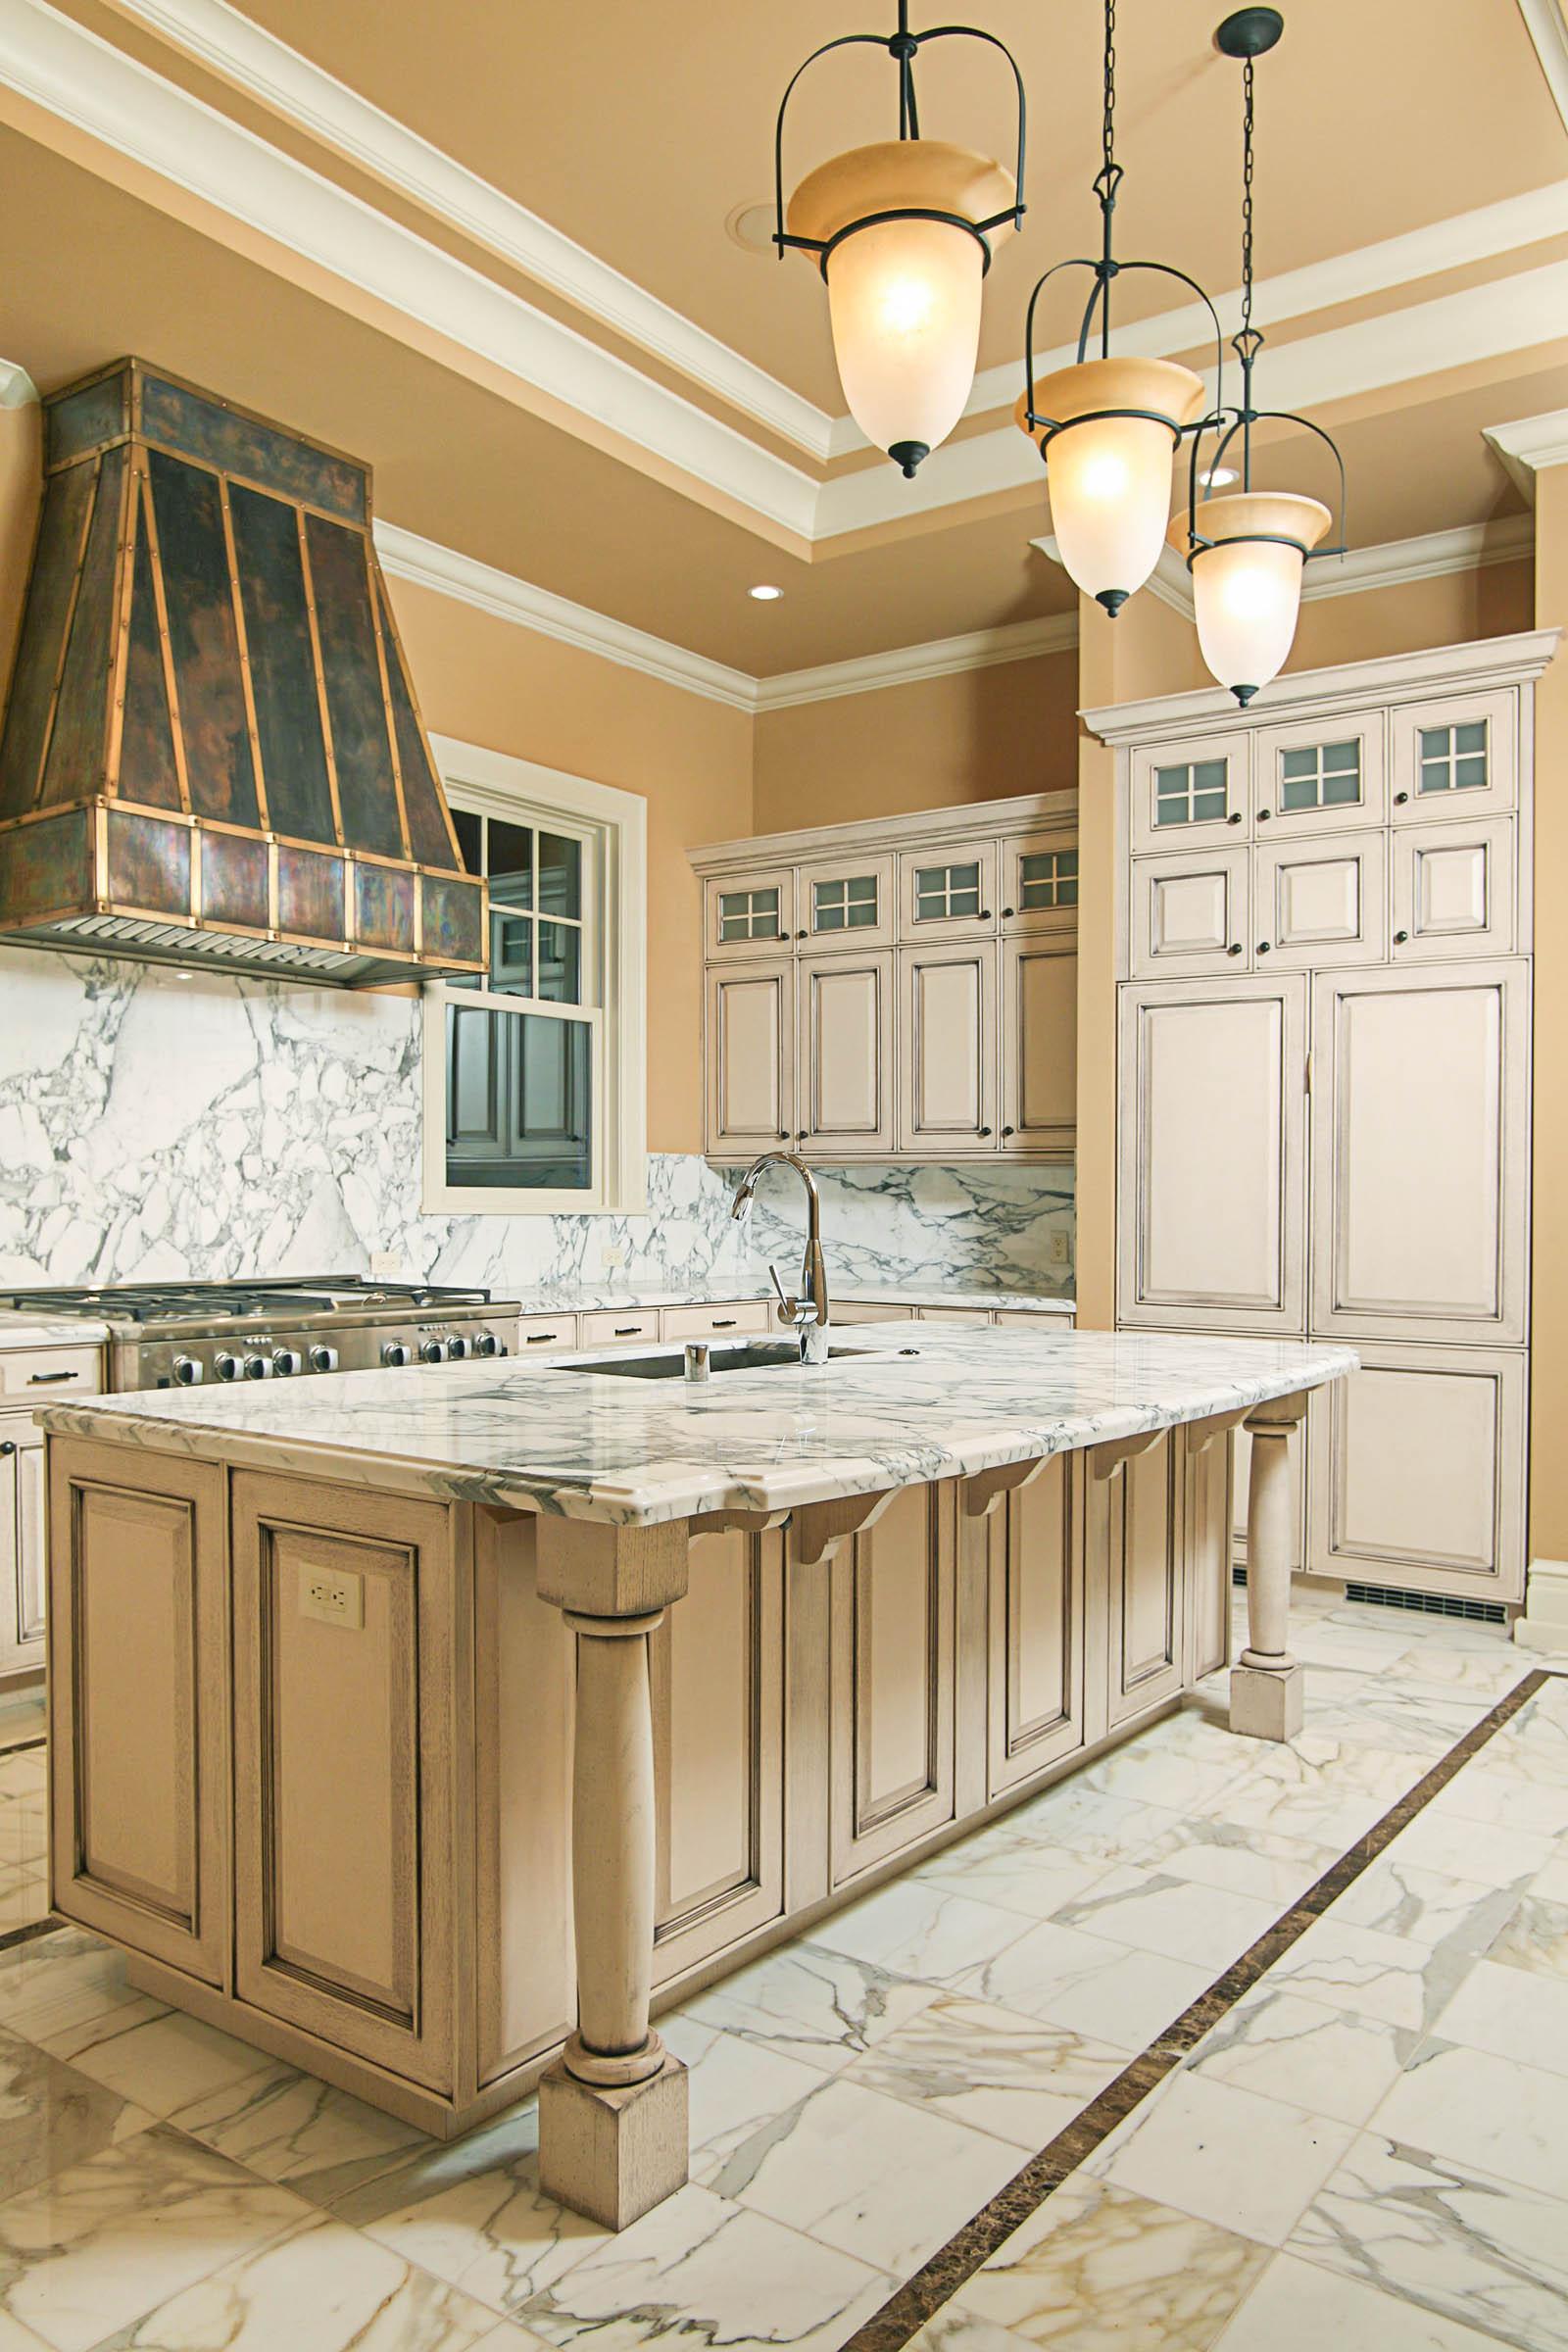 kitchen floors kitchen floors kitchen floor 2a after